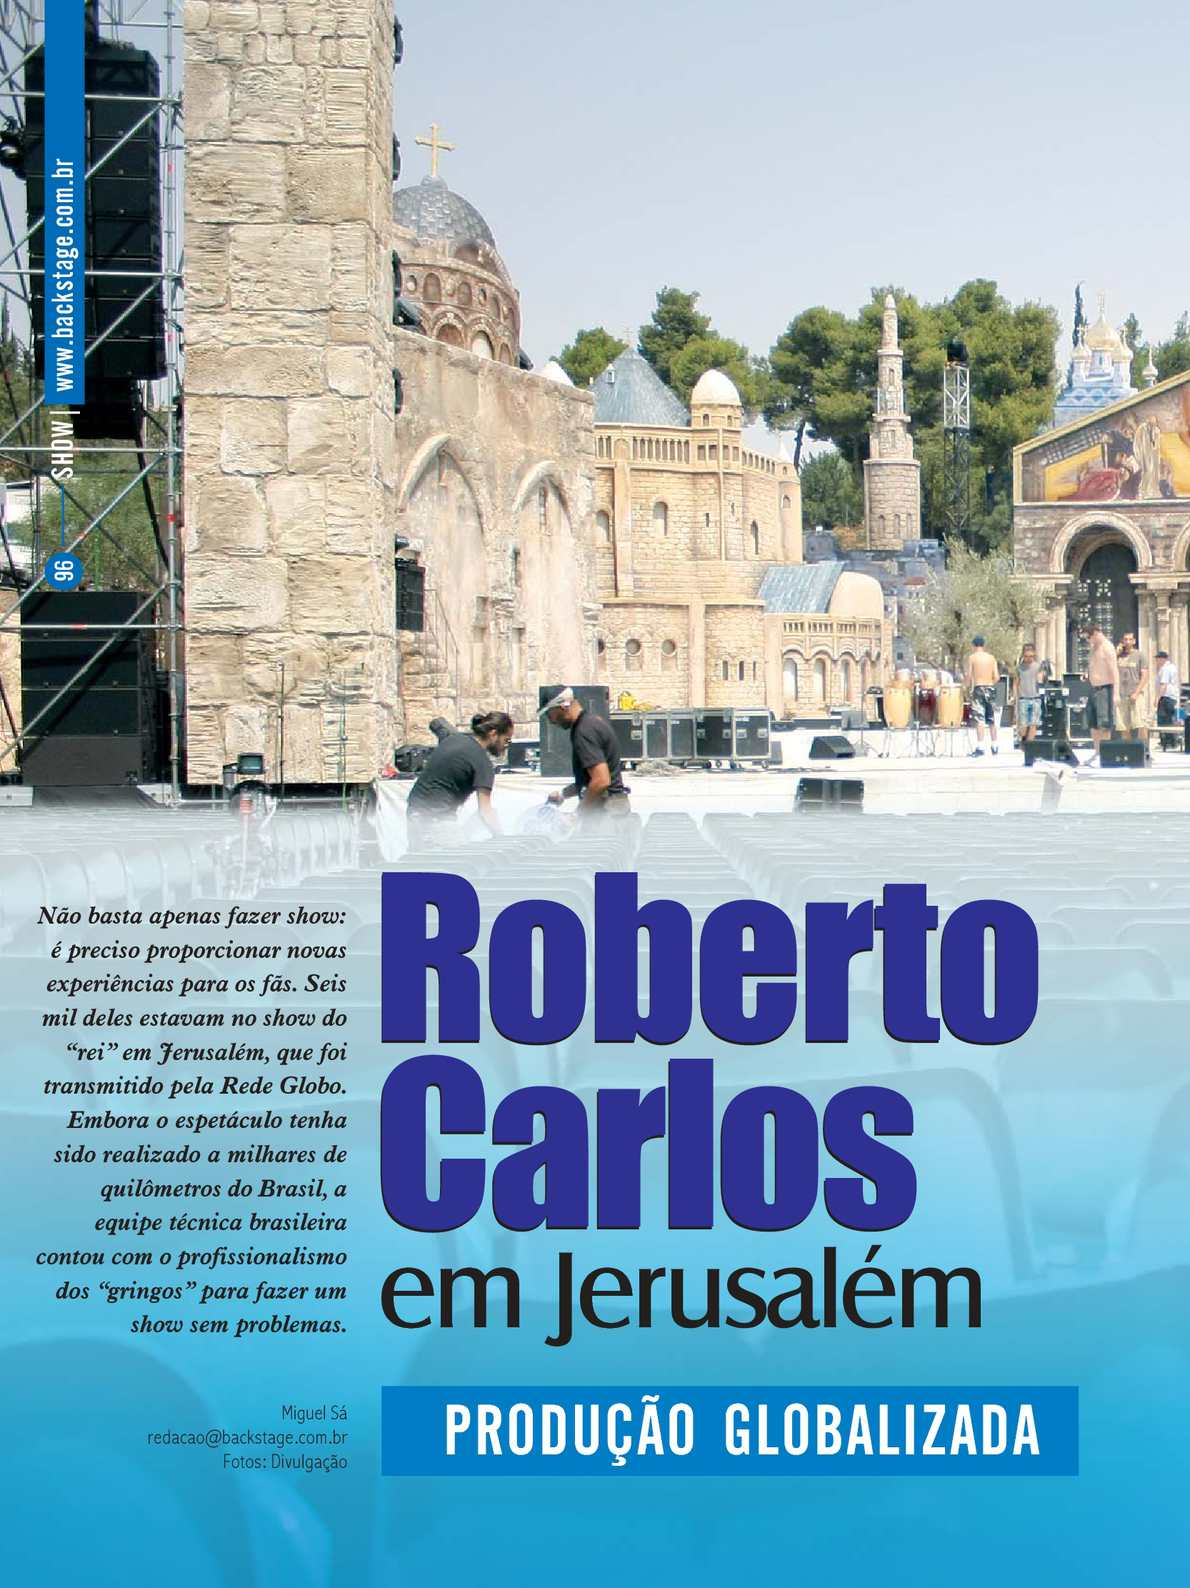 EM CARLOS JERUSALEM RMVB ROBERTO DVD BAIXAR